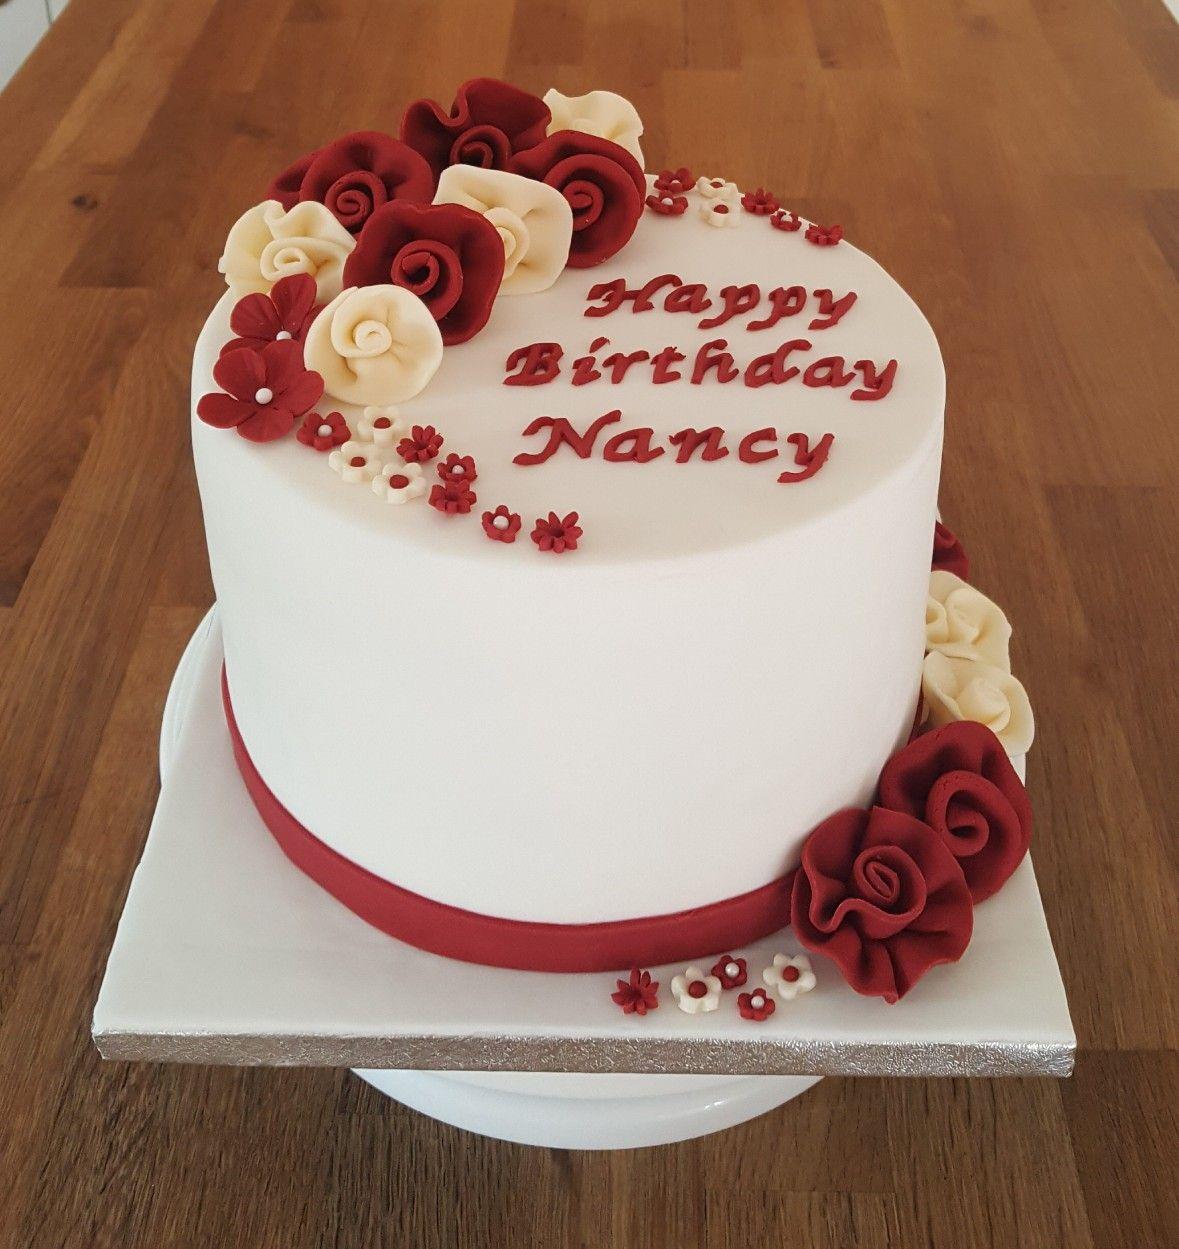 93rd Birthday Cake with ruffled rose flowers   Alwynne\'s Homemade ...